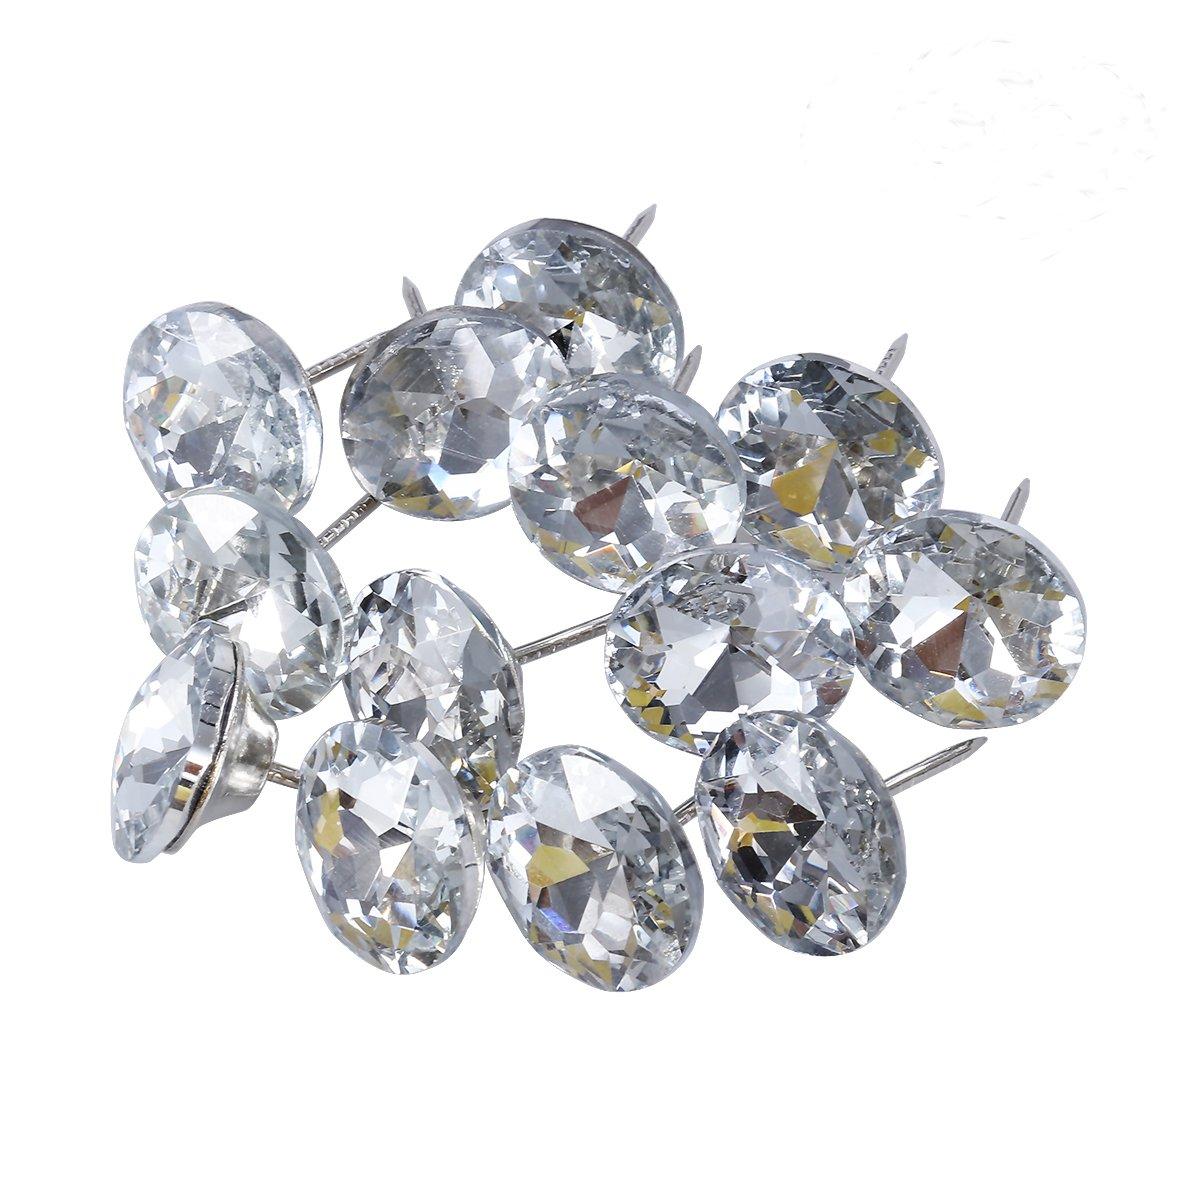 ROSENICE 25mm Sew Buttons Diamond Crystal Upholstery Nails Tacks Sofa Wall Decor 20Pcs 4336922431